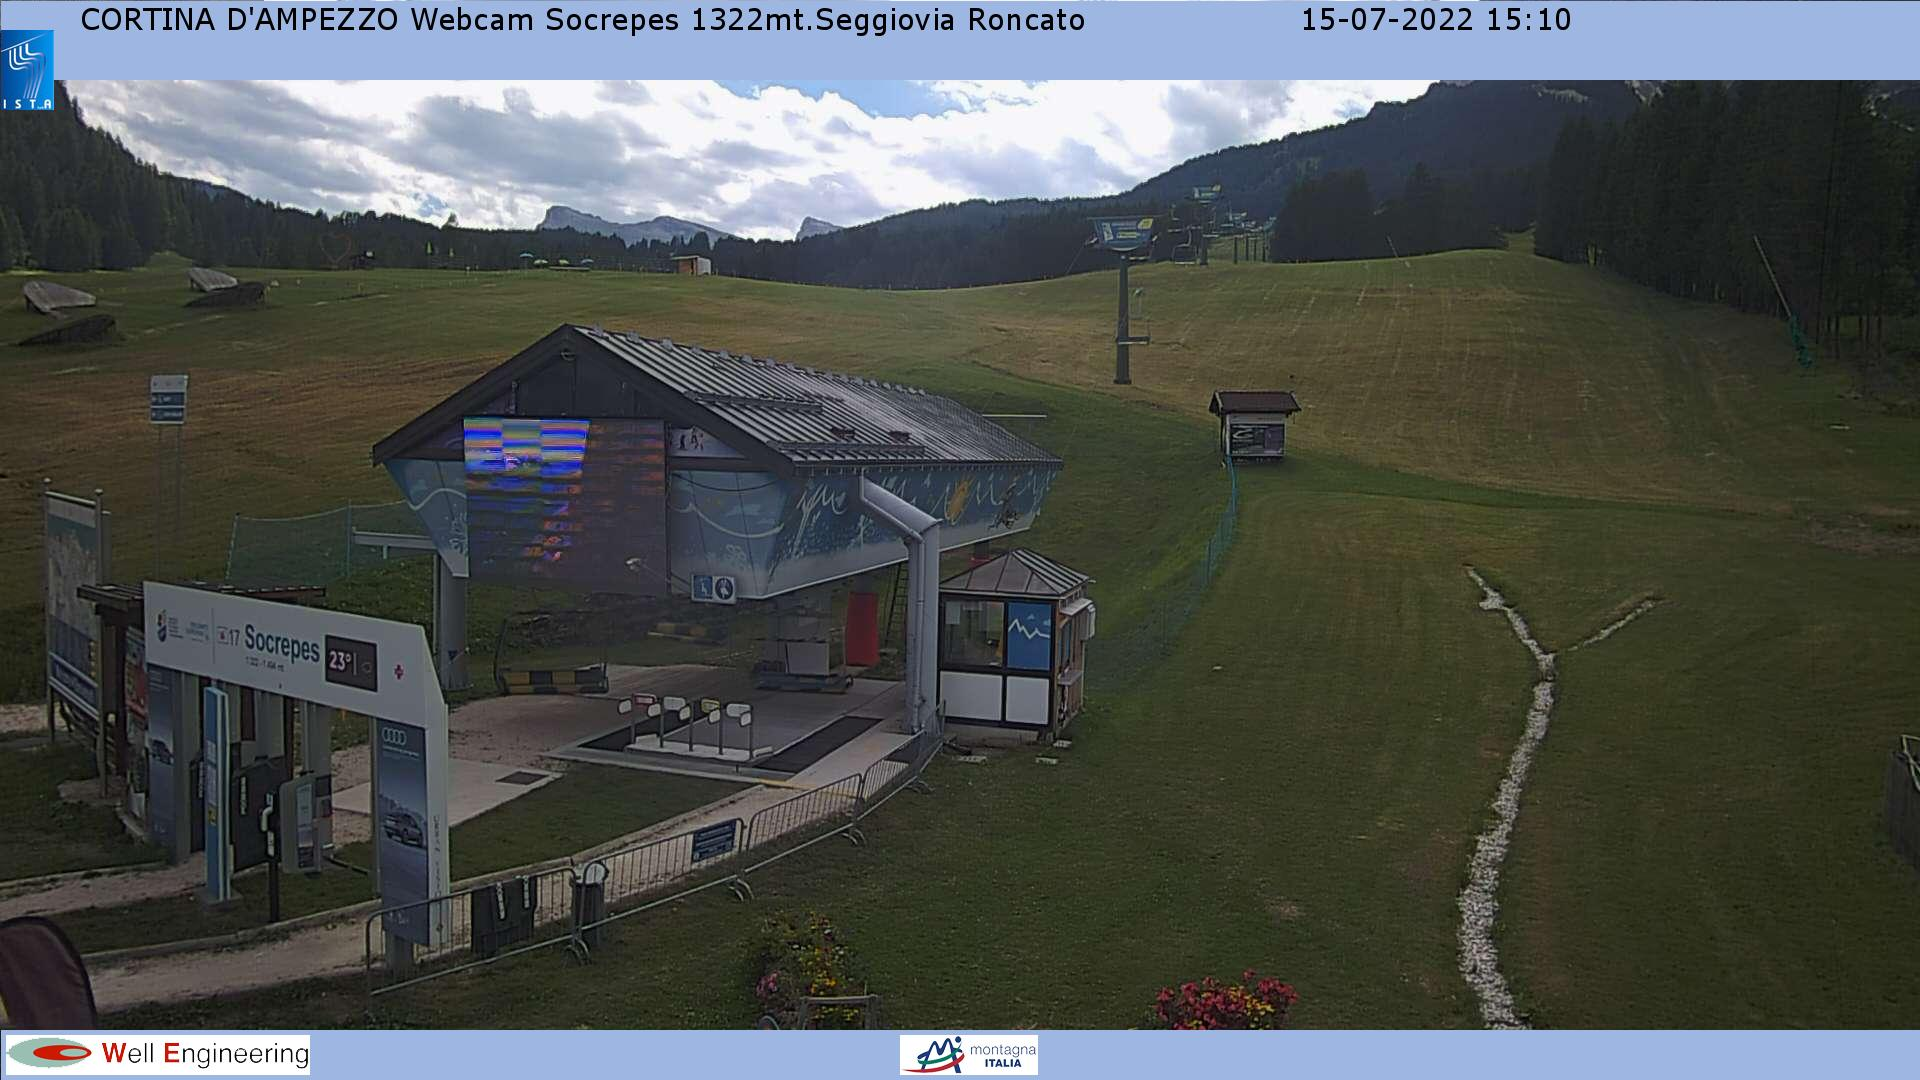 Cortina - Pista Socrepes